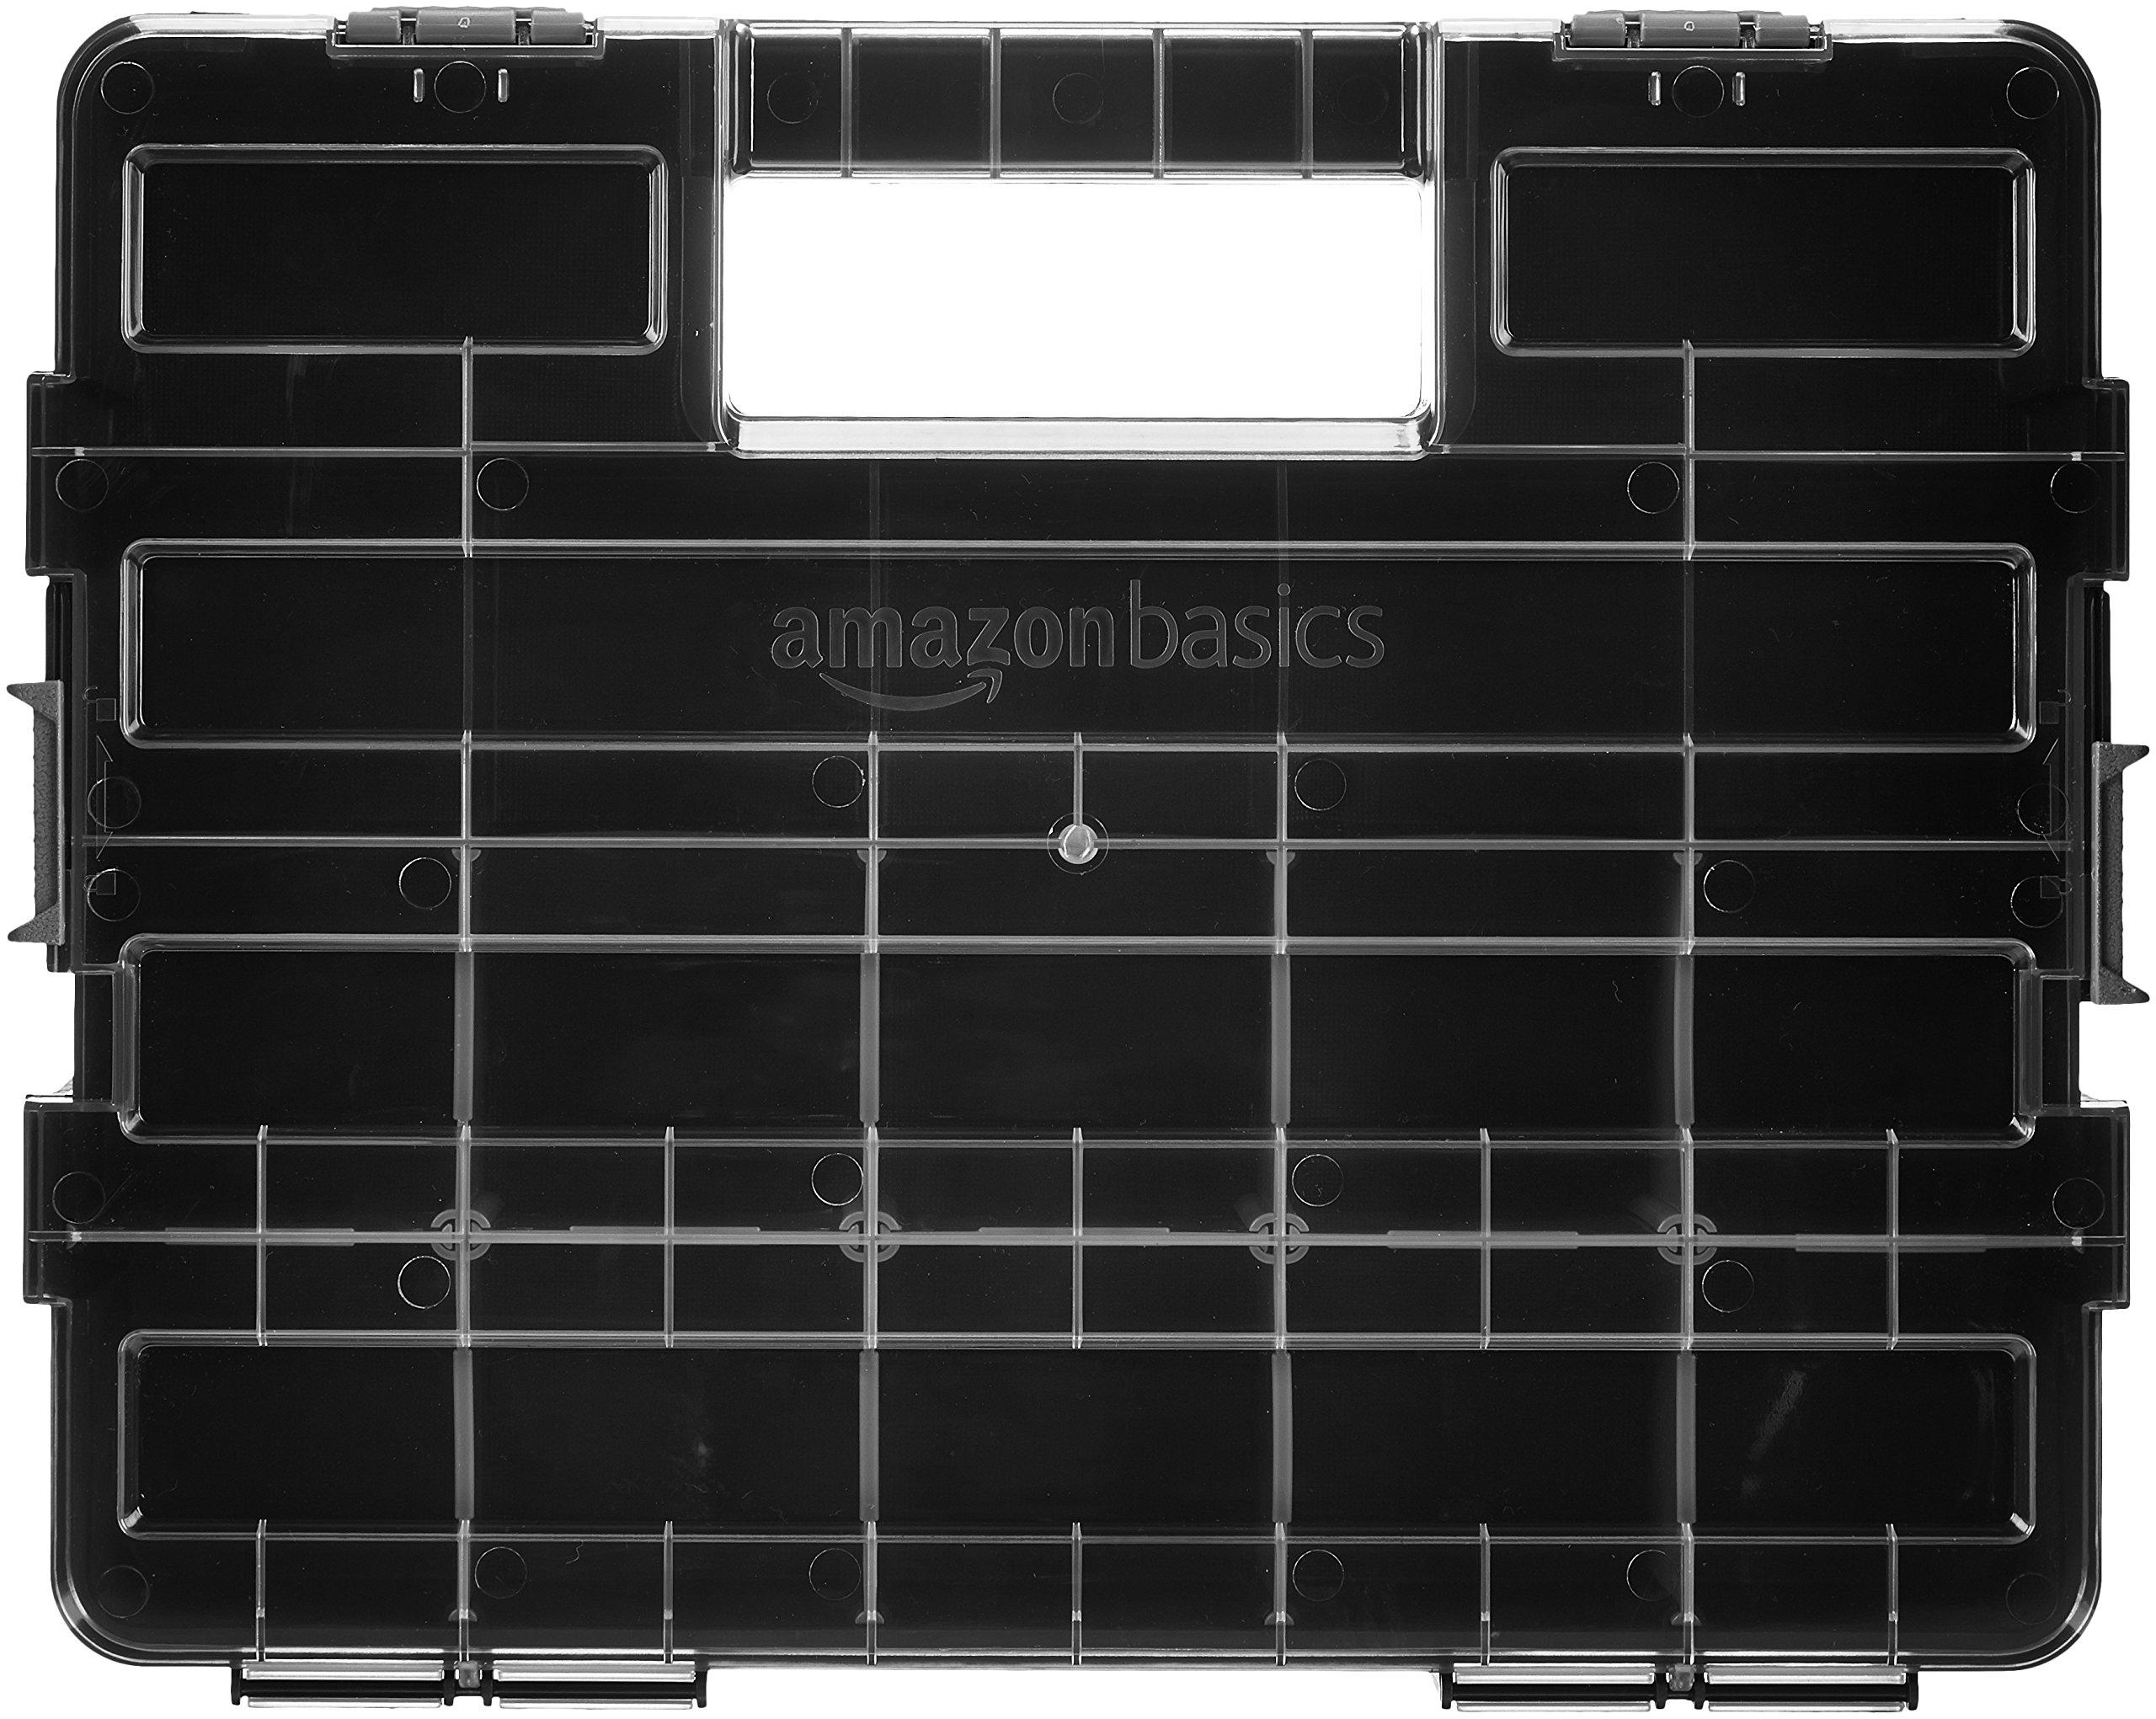 AmazonBasics Tool Organizer - Adjustable Compartments by AmazonBasics